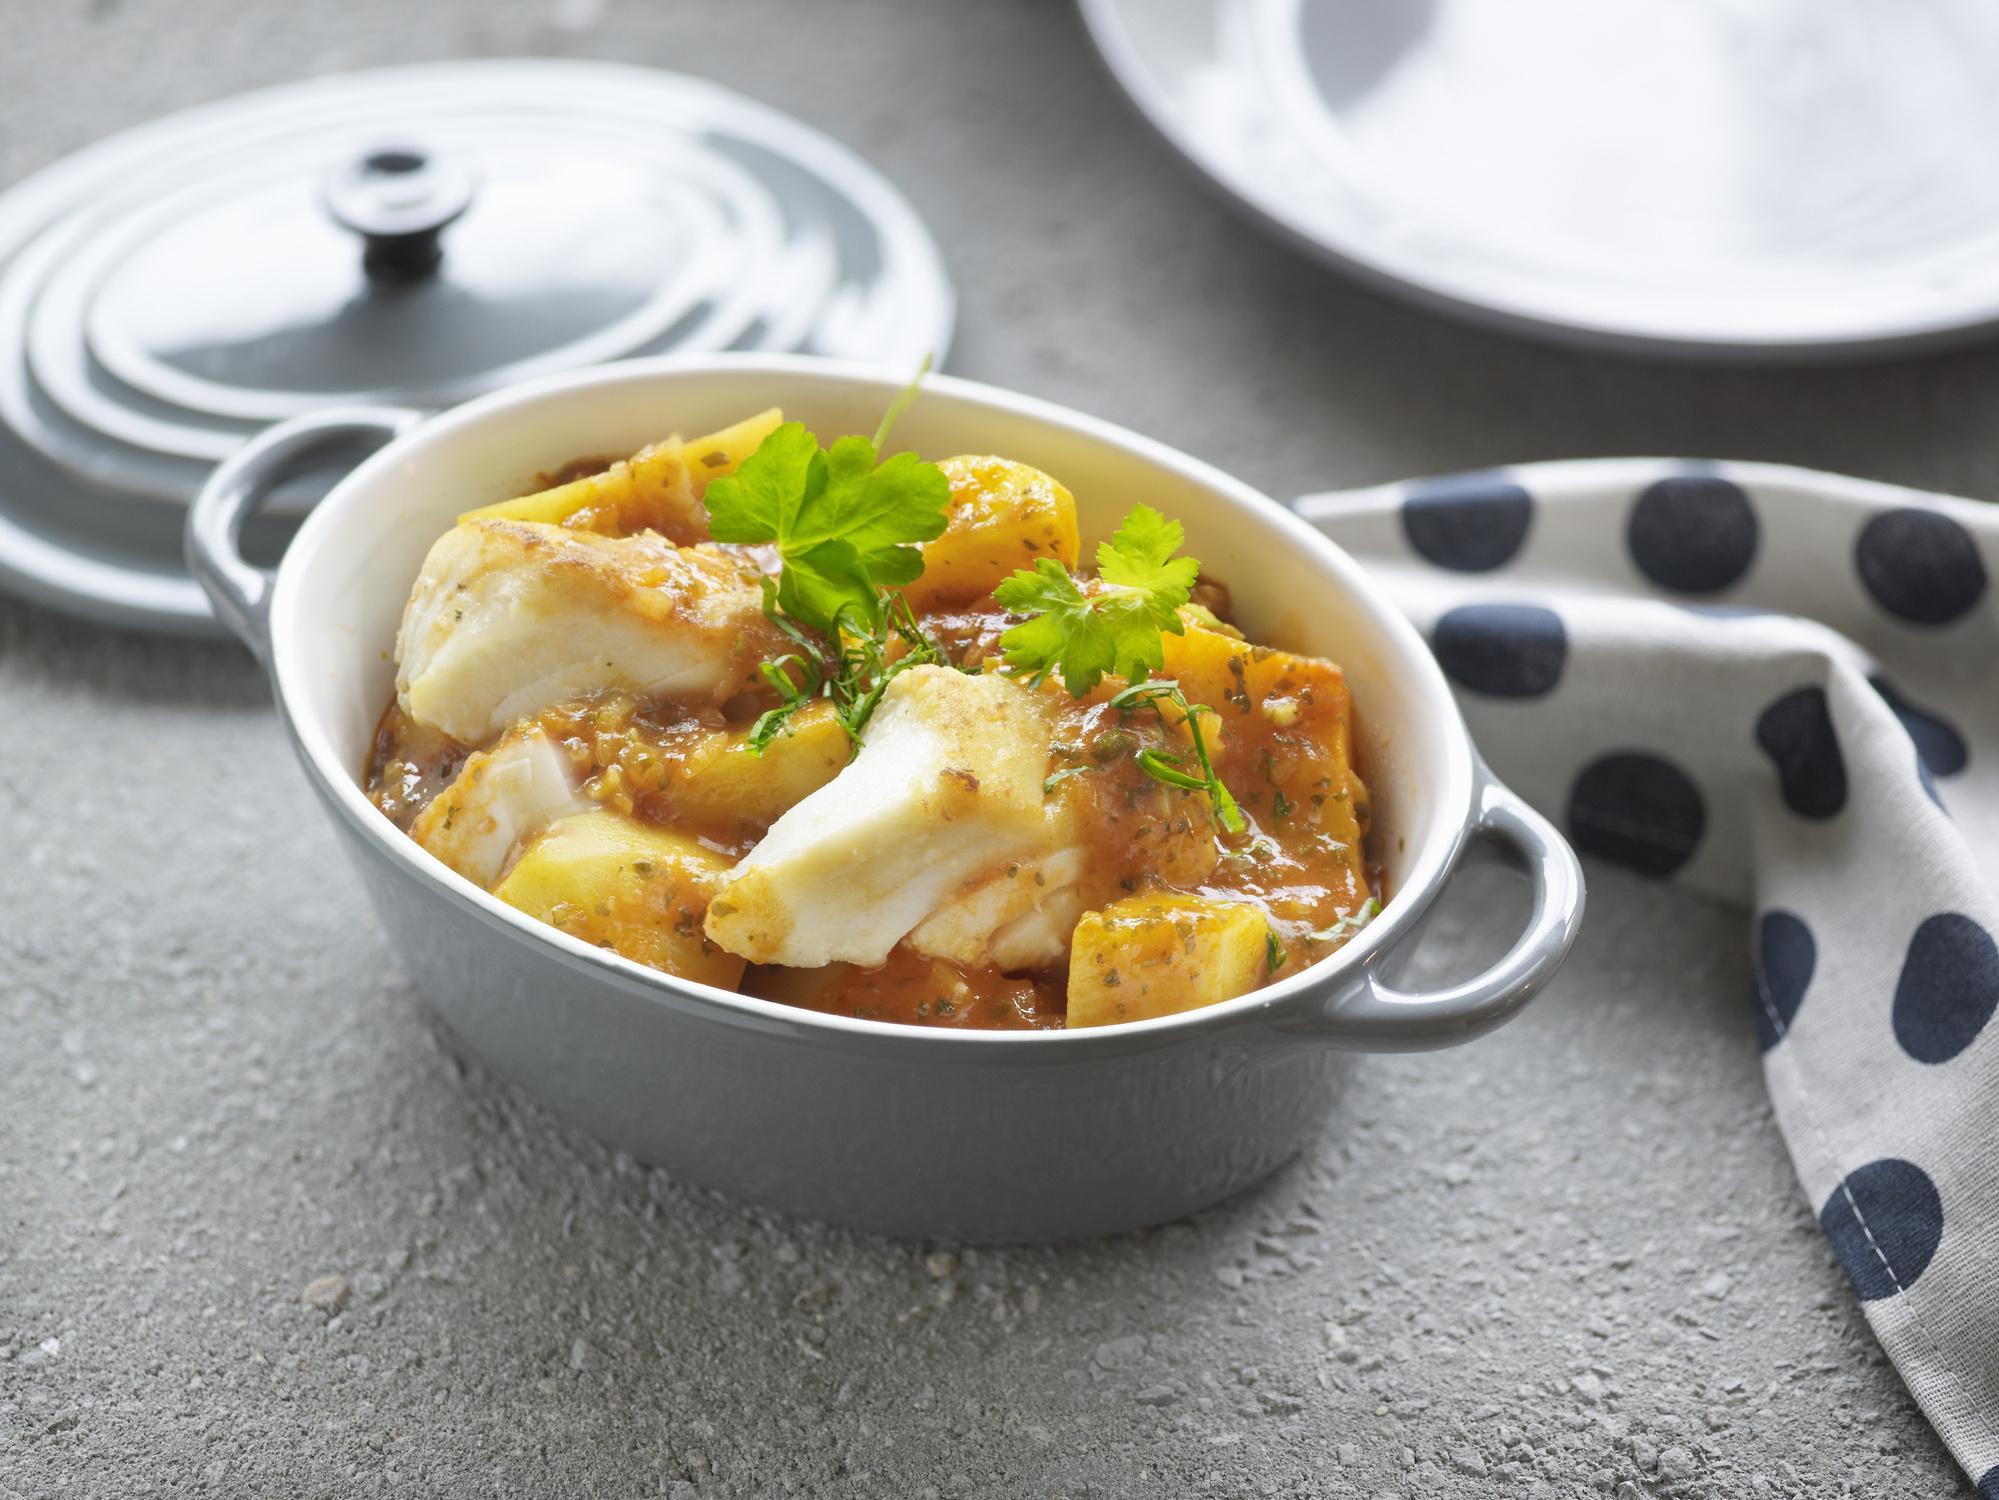 стейки трески с картошкой в духовке рецепты с фото